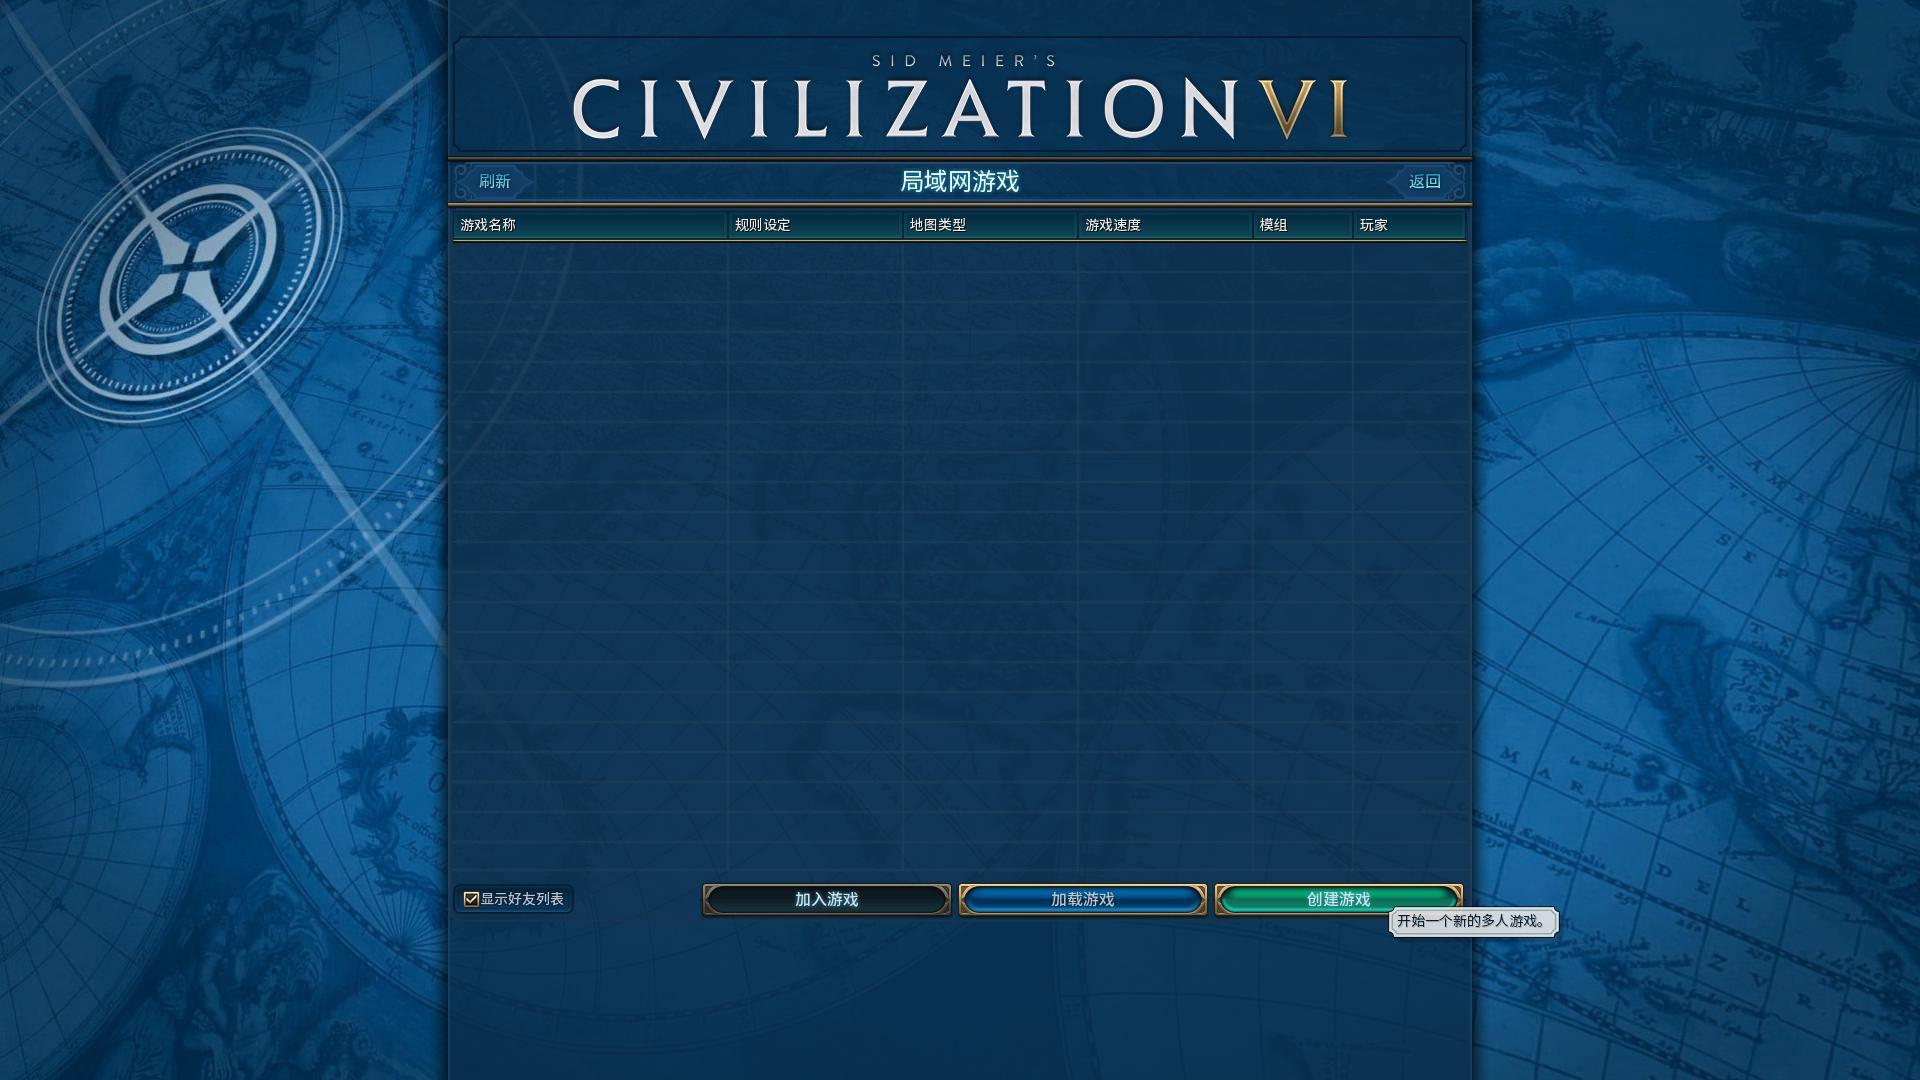 CivilizationVI 2016-10-21 15-06-47-39.jpg